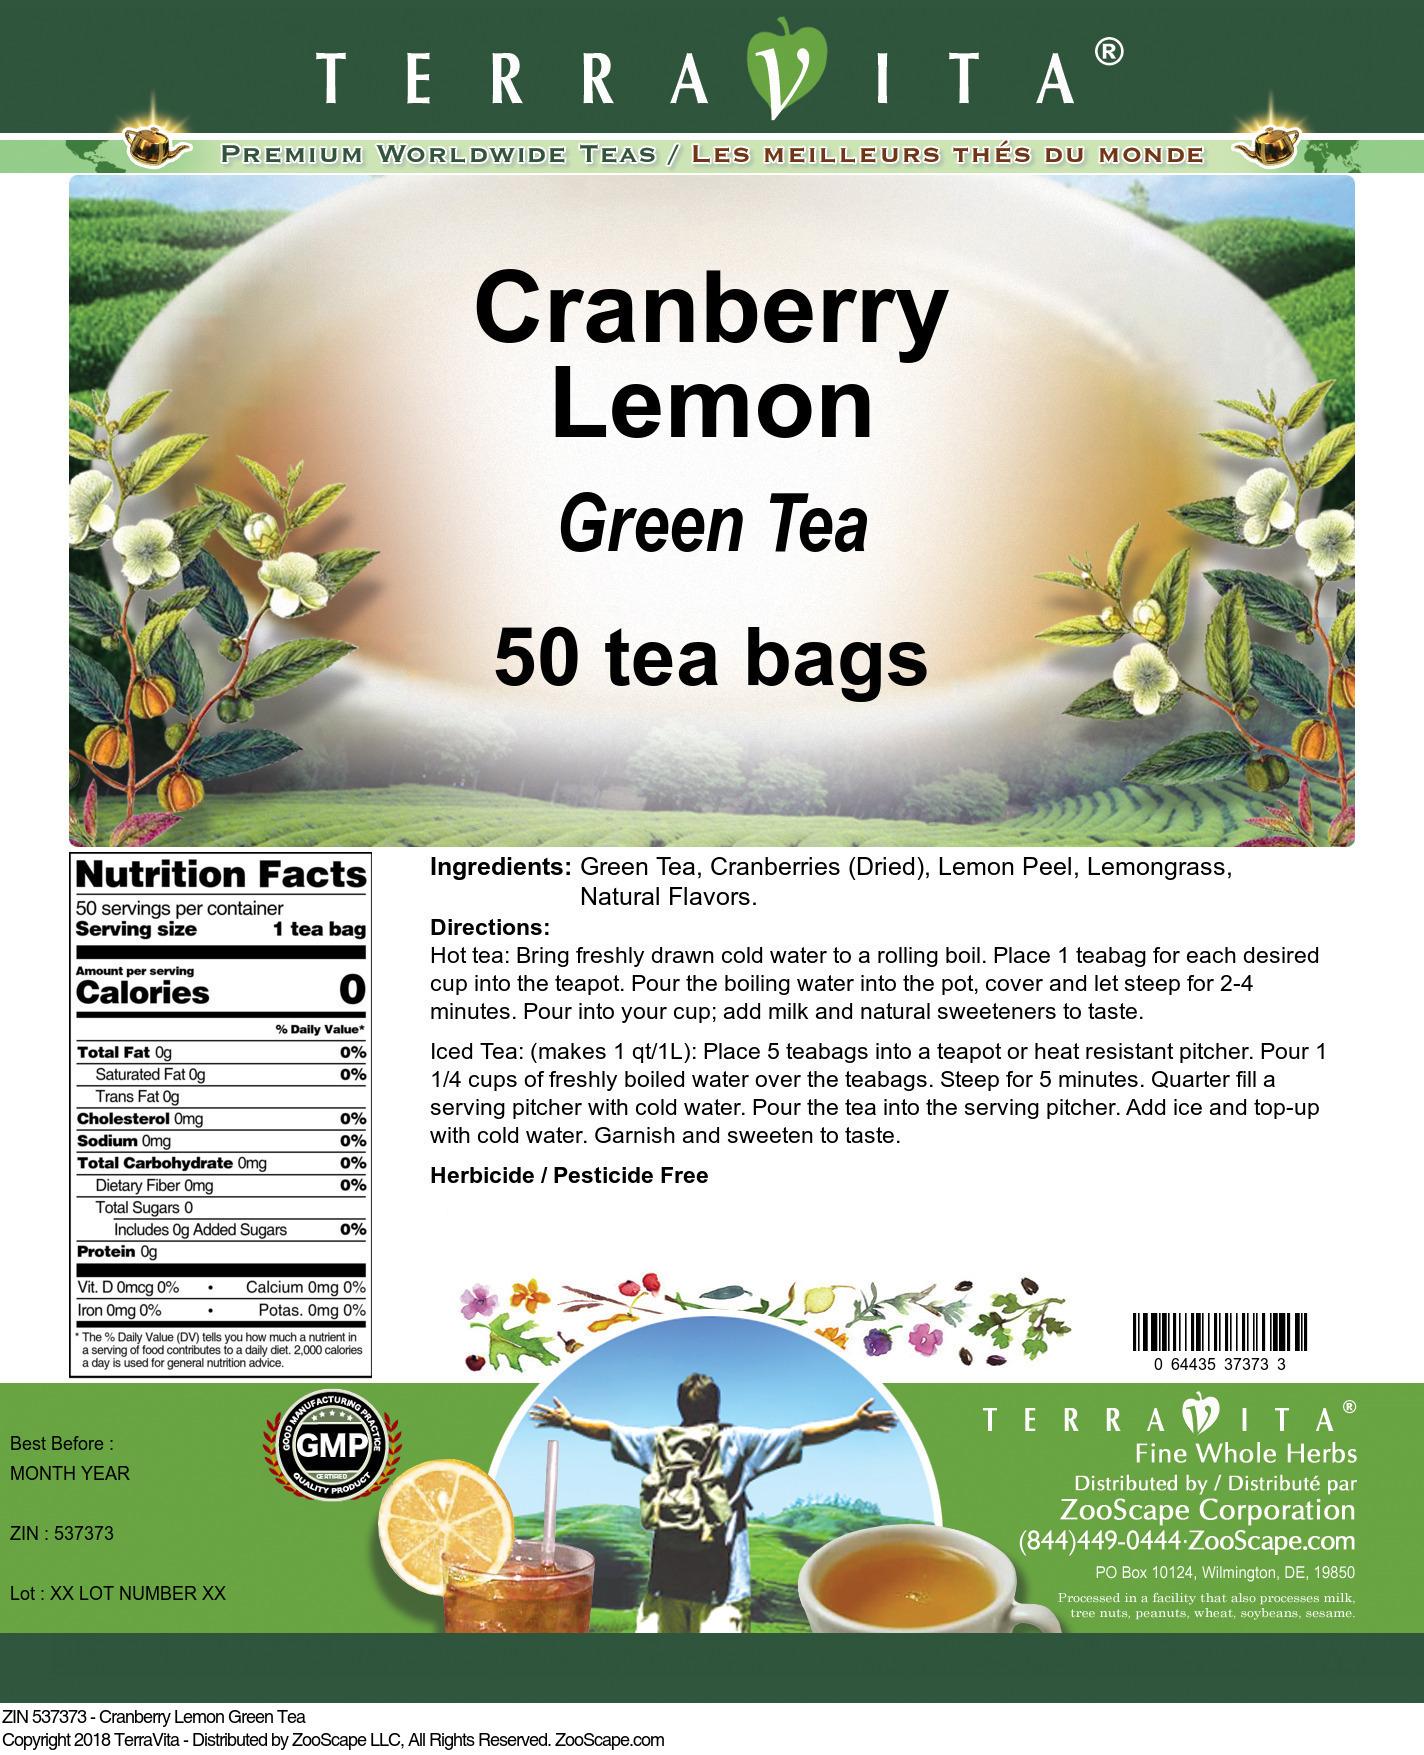 Cranberry Lemon Green Tea